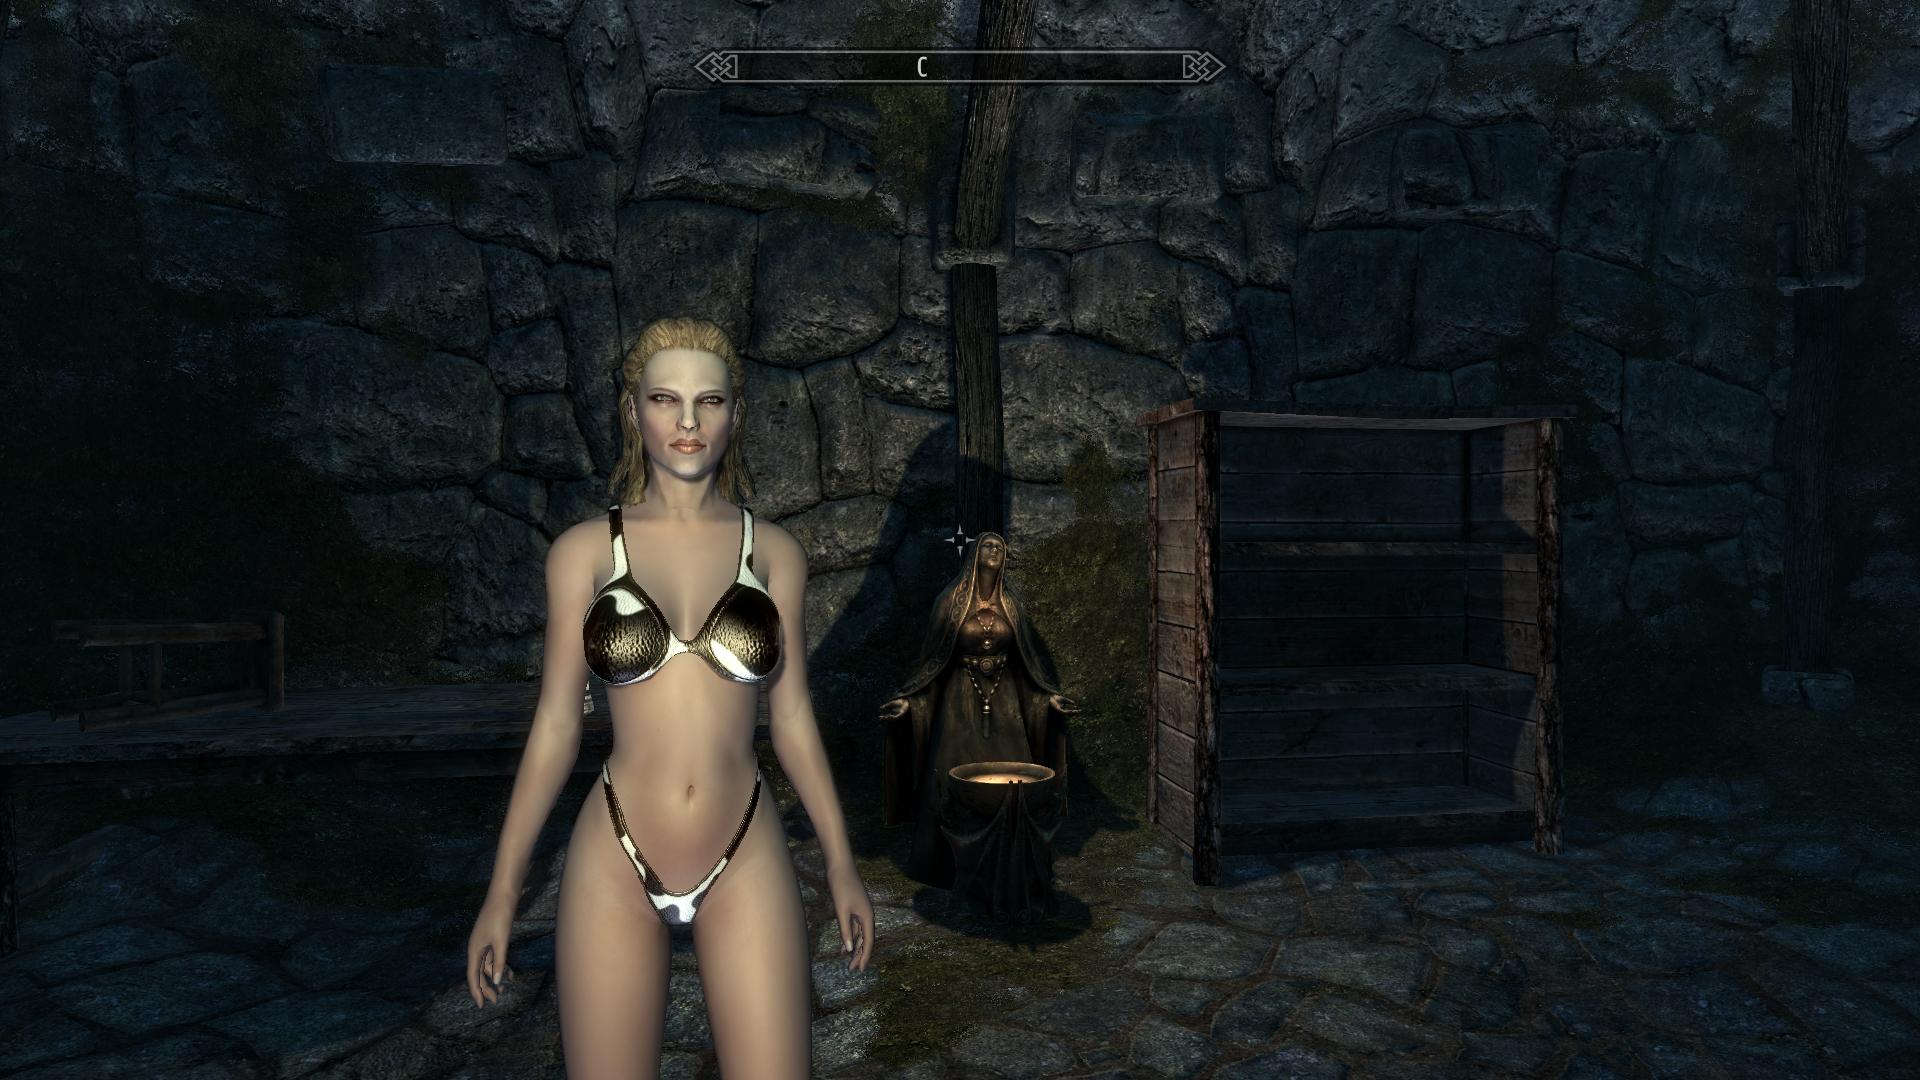 Elder-Scrolls-V-Skyrim-Screenshot-2020-1